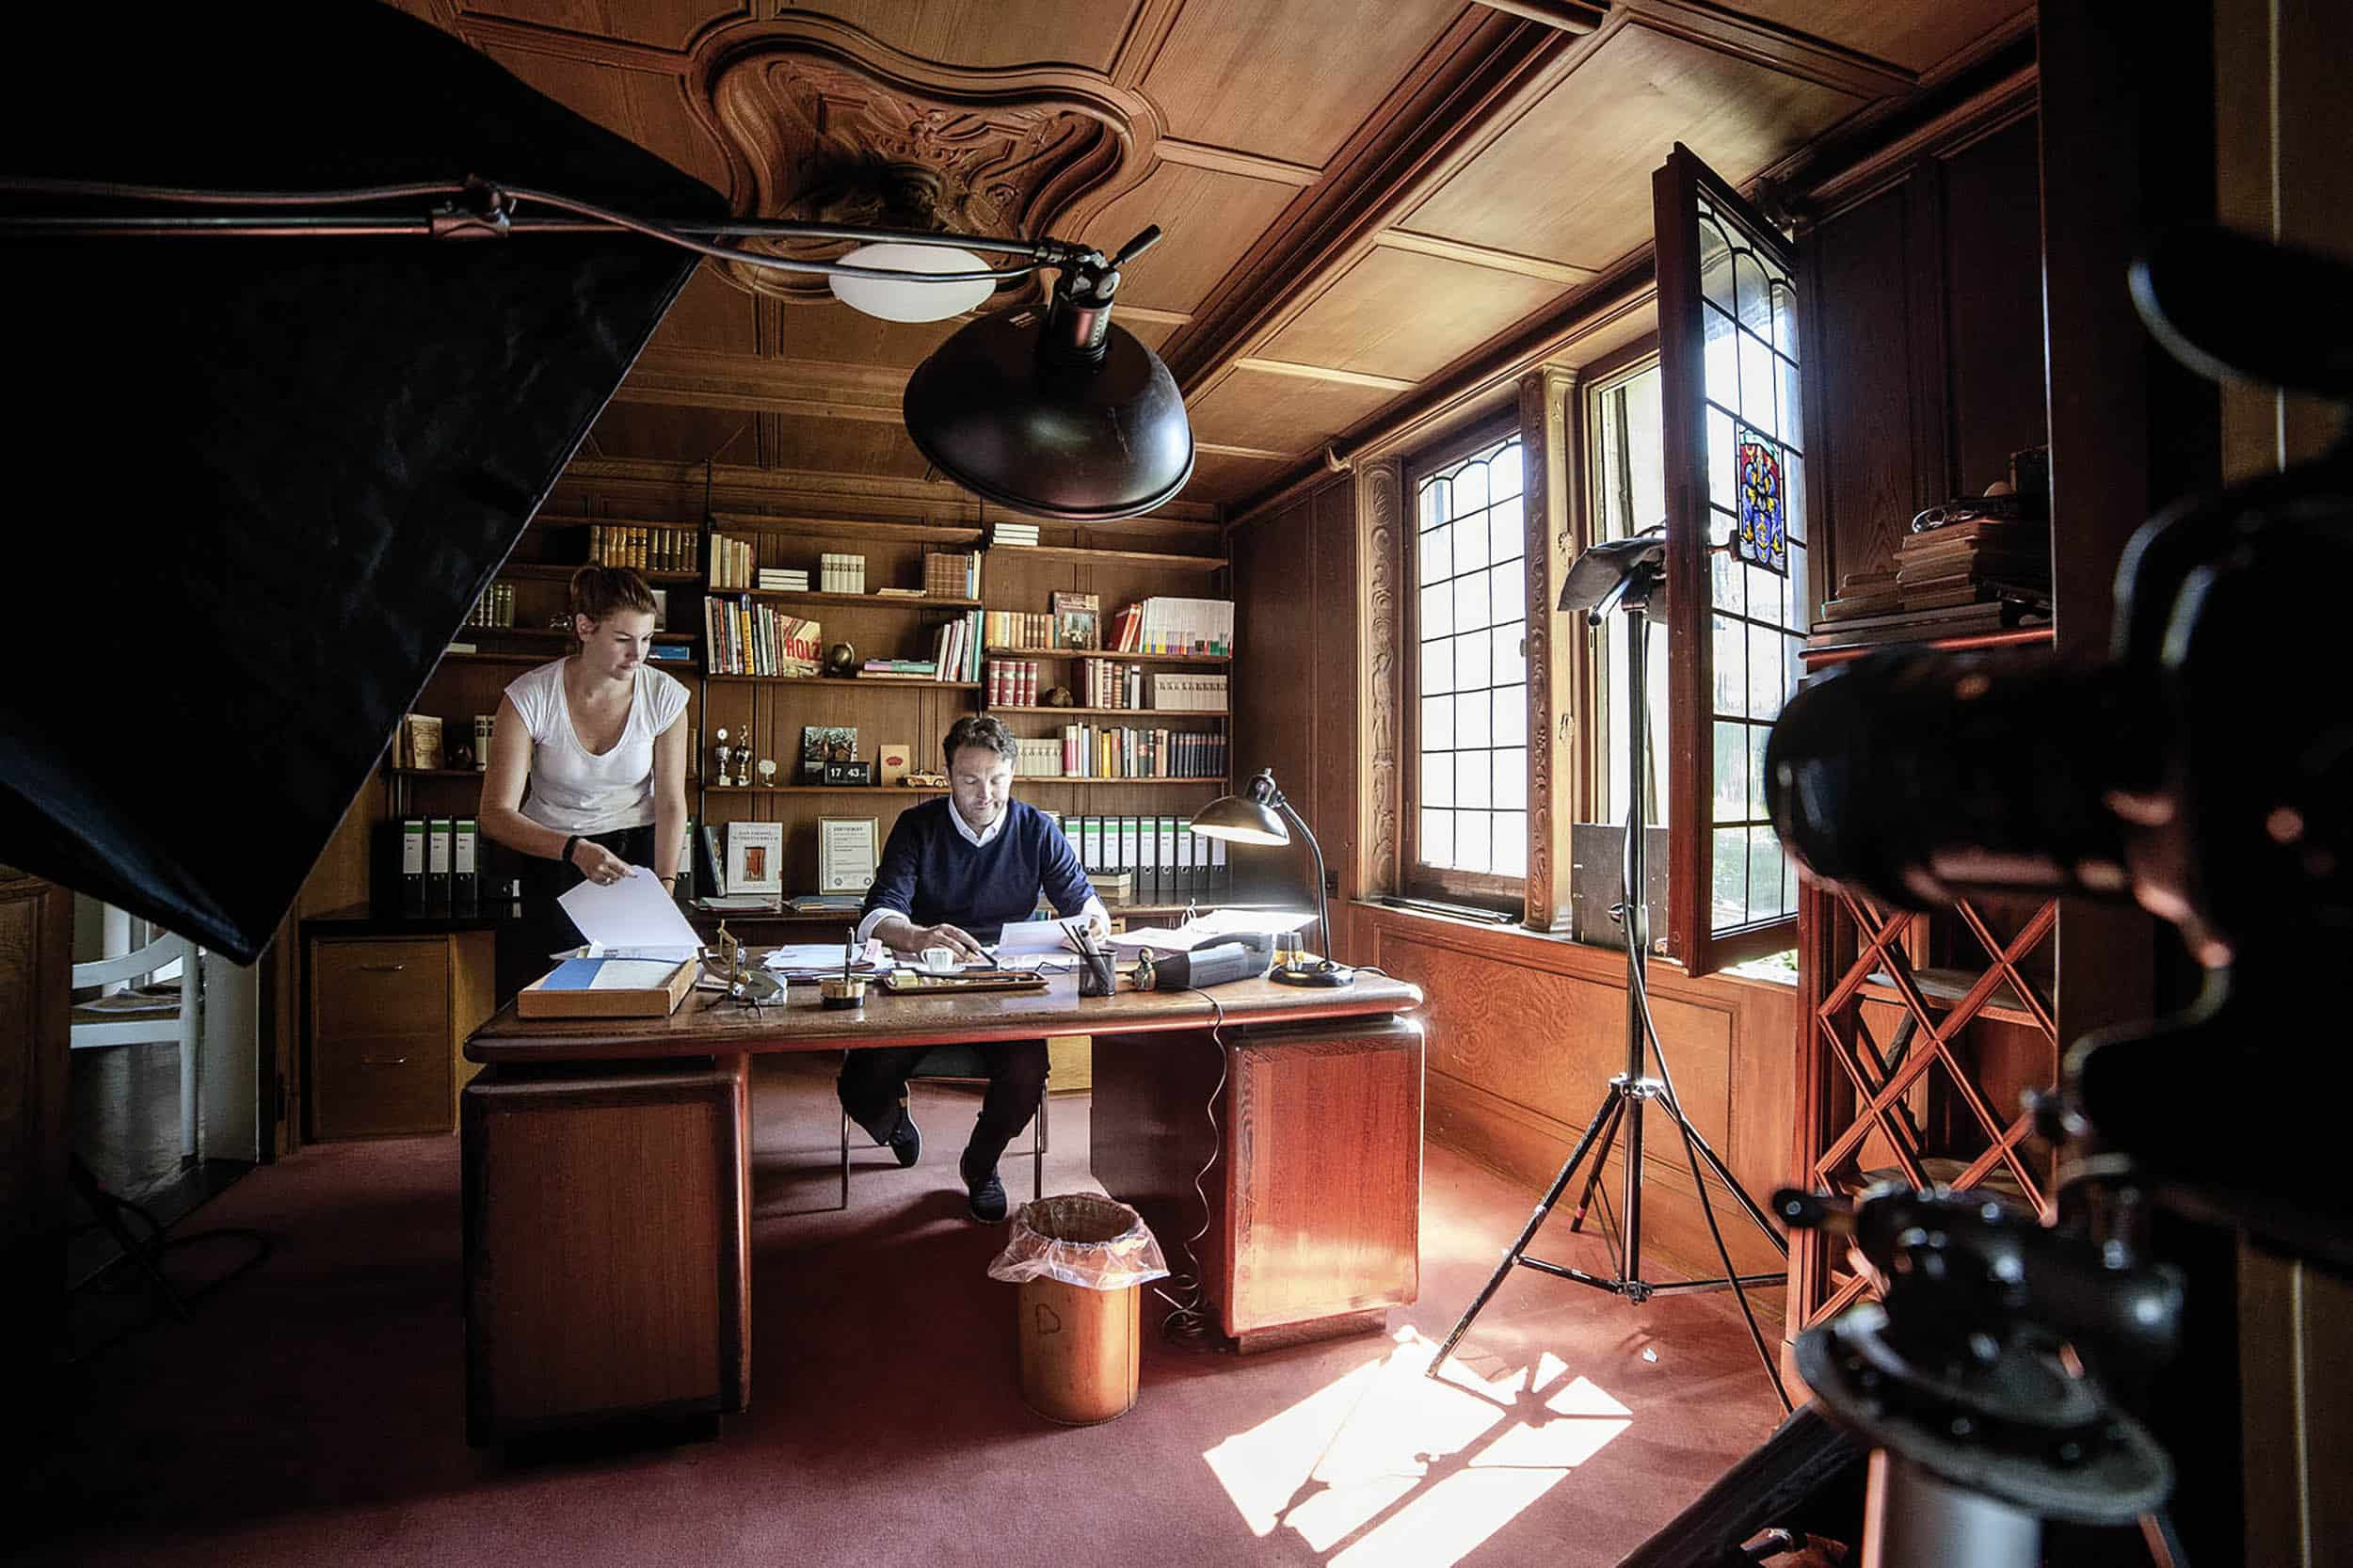 studio-ignatov-sbb-b2b-travel-main-ch-imagekampagne-makingof-09